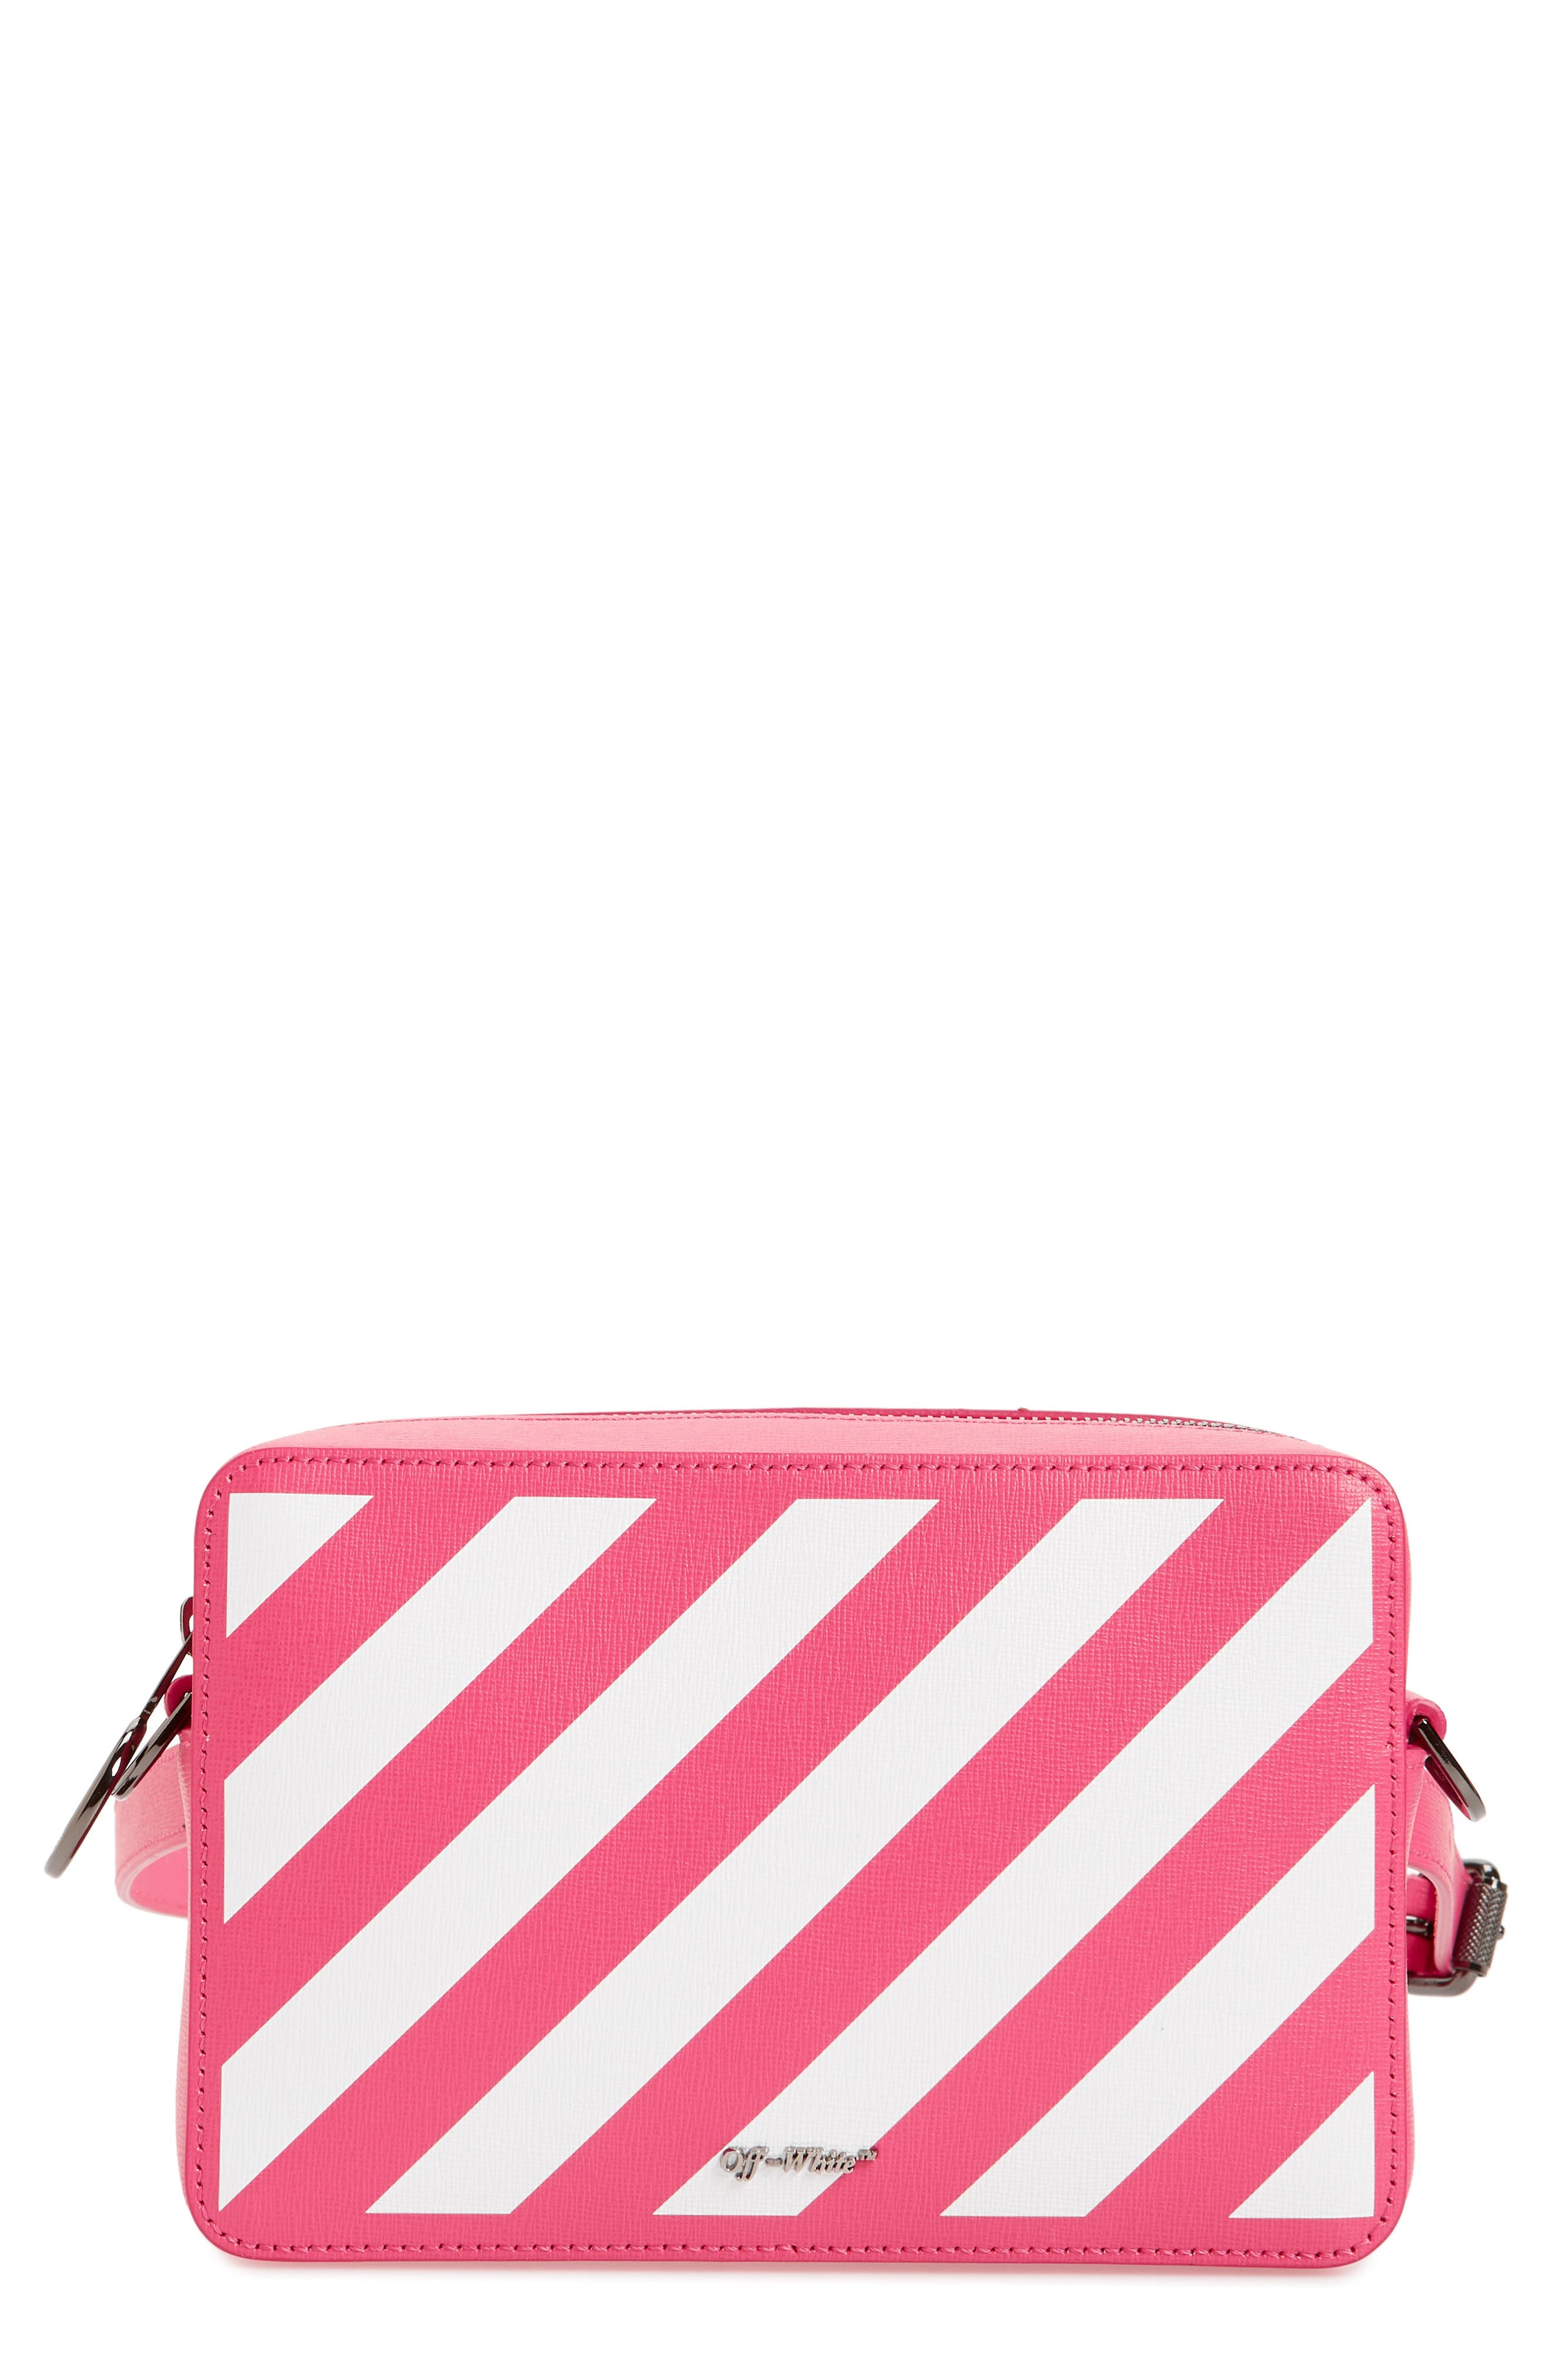 Diagonal Fanny Pack - Pink in Fucshia White